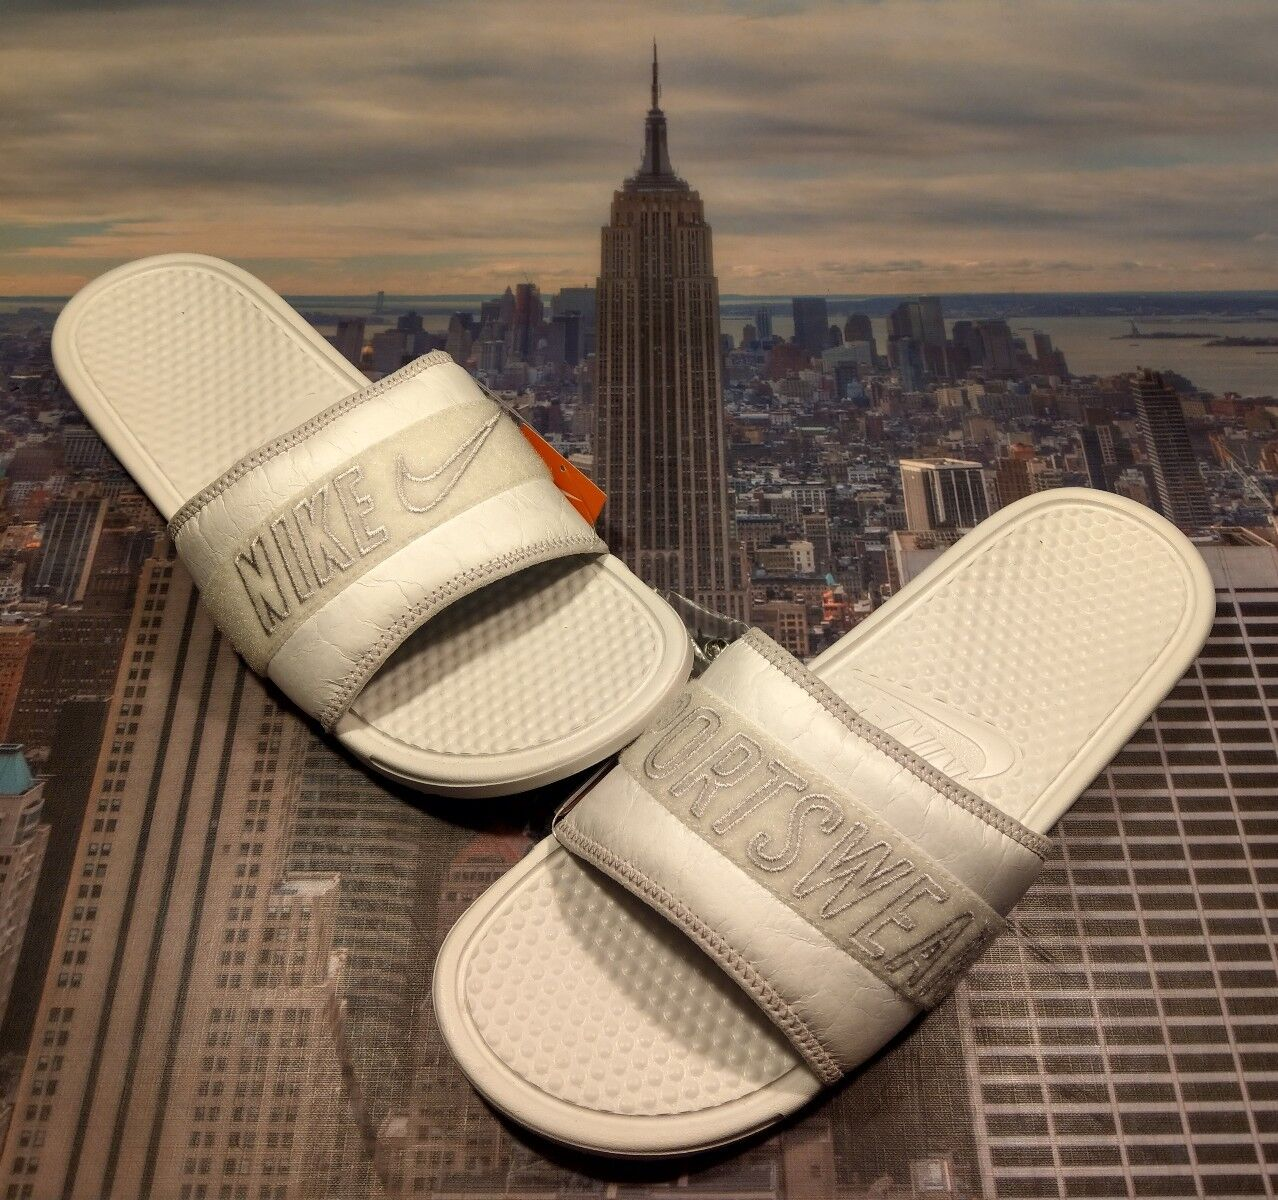 Nike Benassi JDI Tivek All Star Weekend Slide Sandal Mens Size 13 AO2787 100 New